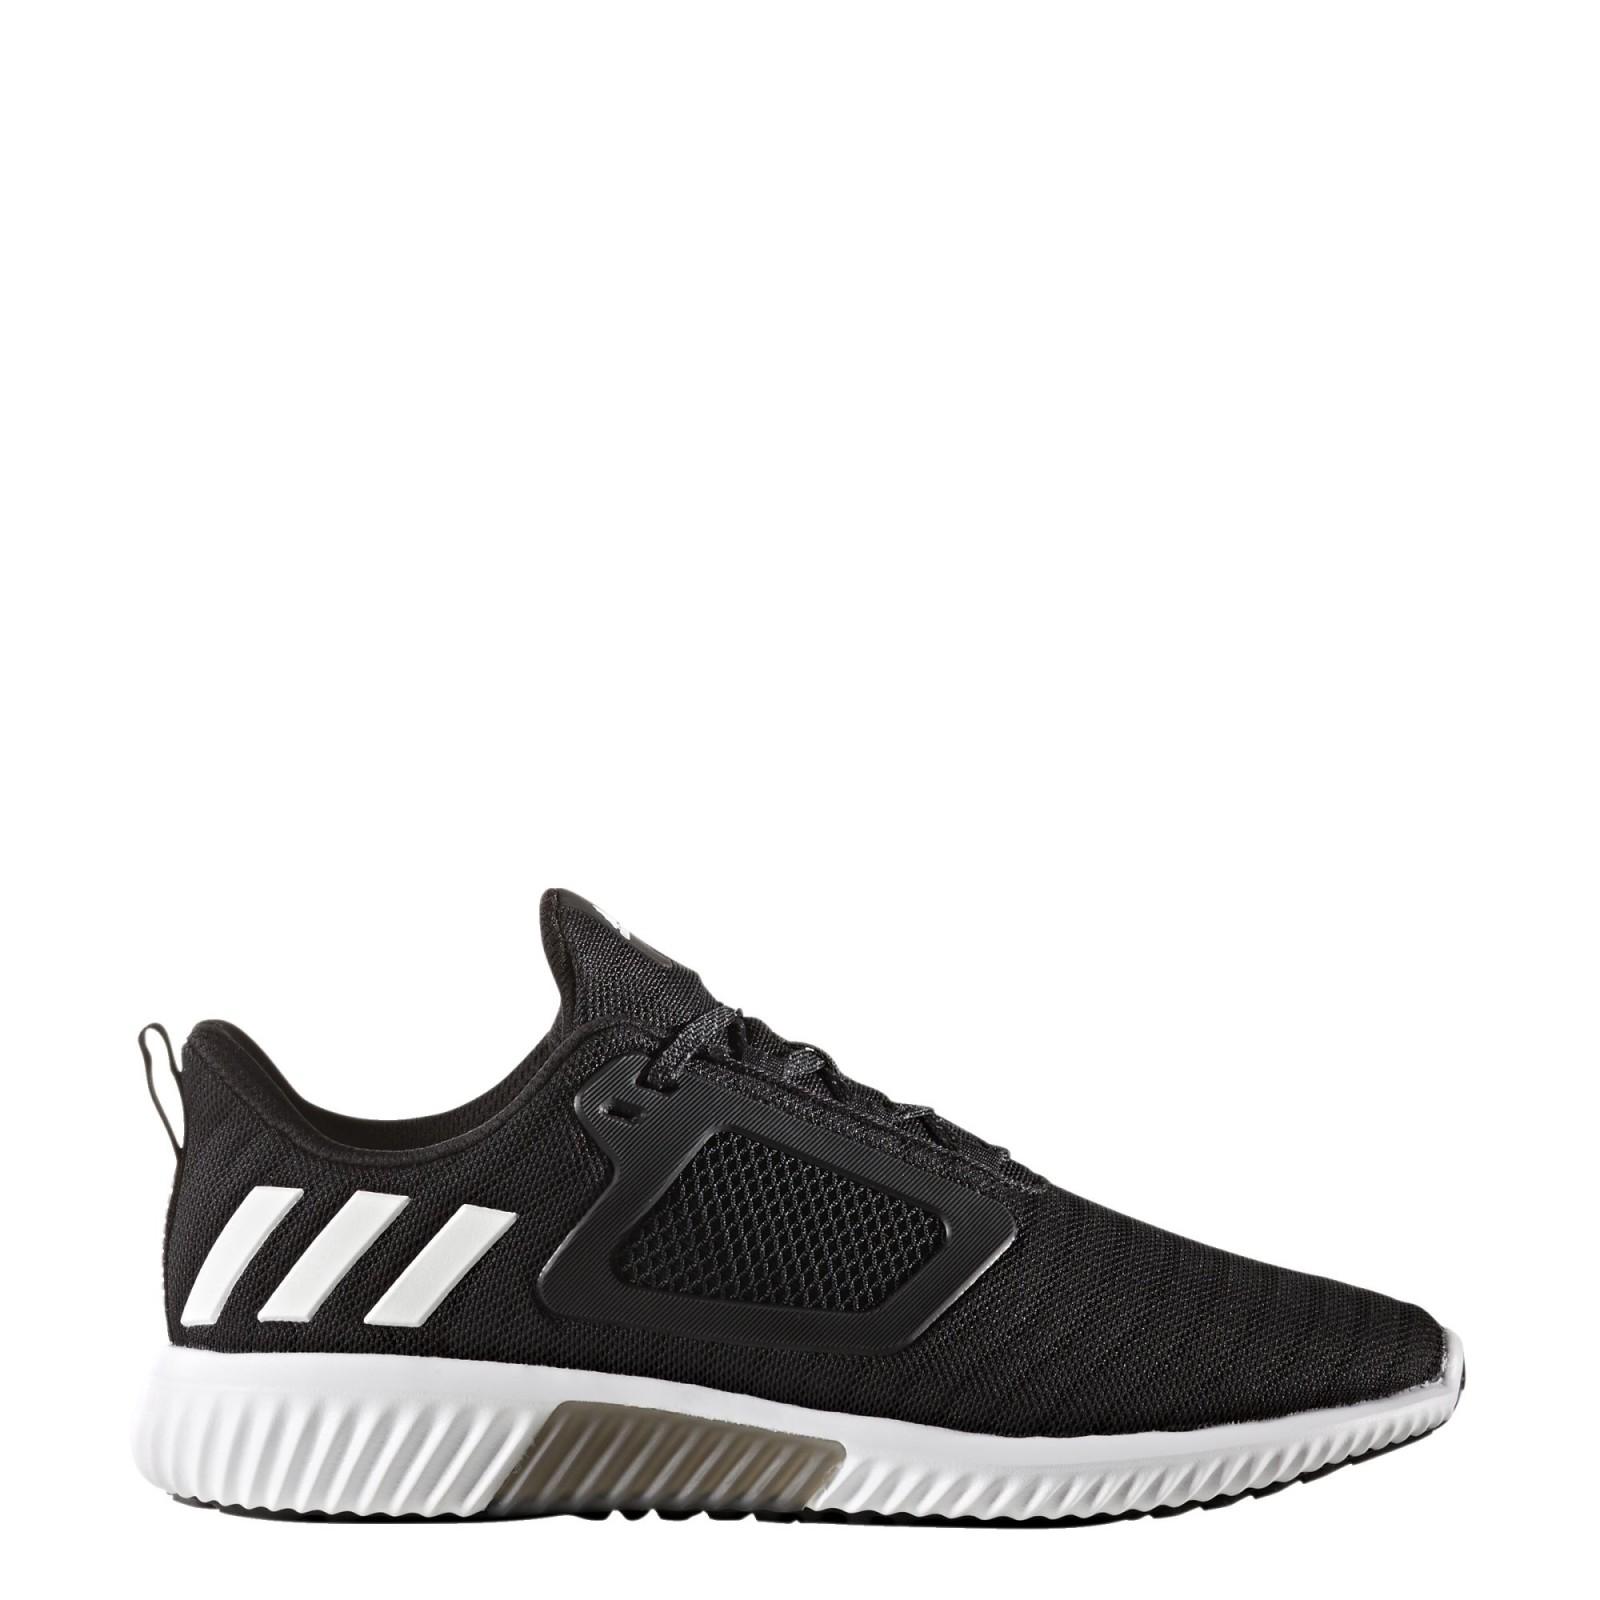 Pánské běžecké boty adidas Performance Climacool cm  c447bfb4d57